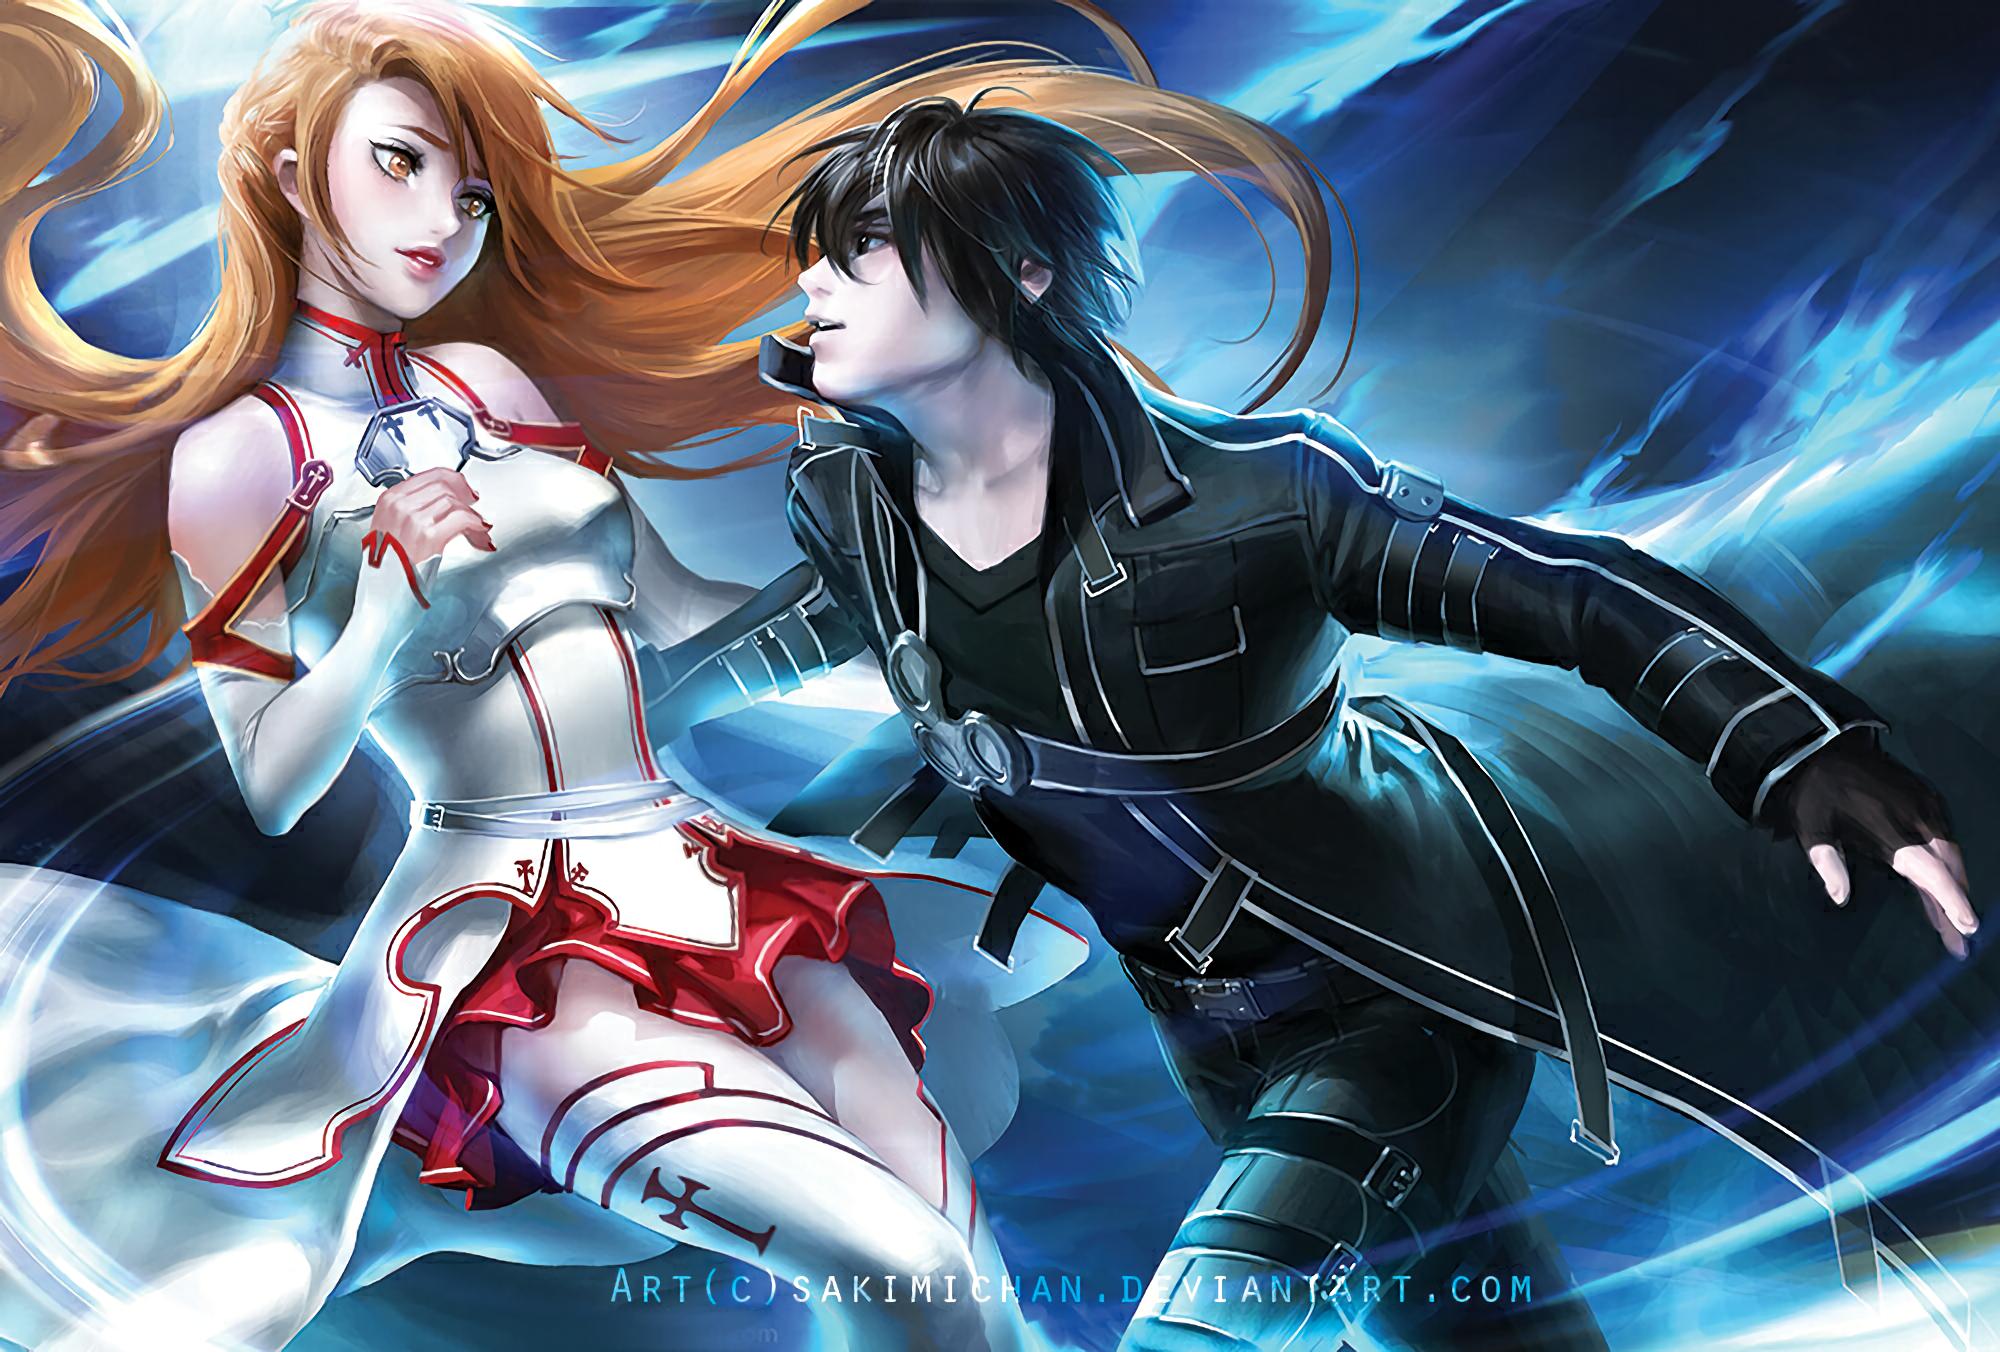 Sword Art Online Fond d'écran HD | Arrière-Plan | 2000x1352 | ID:794518 - Wallpaper Abyss